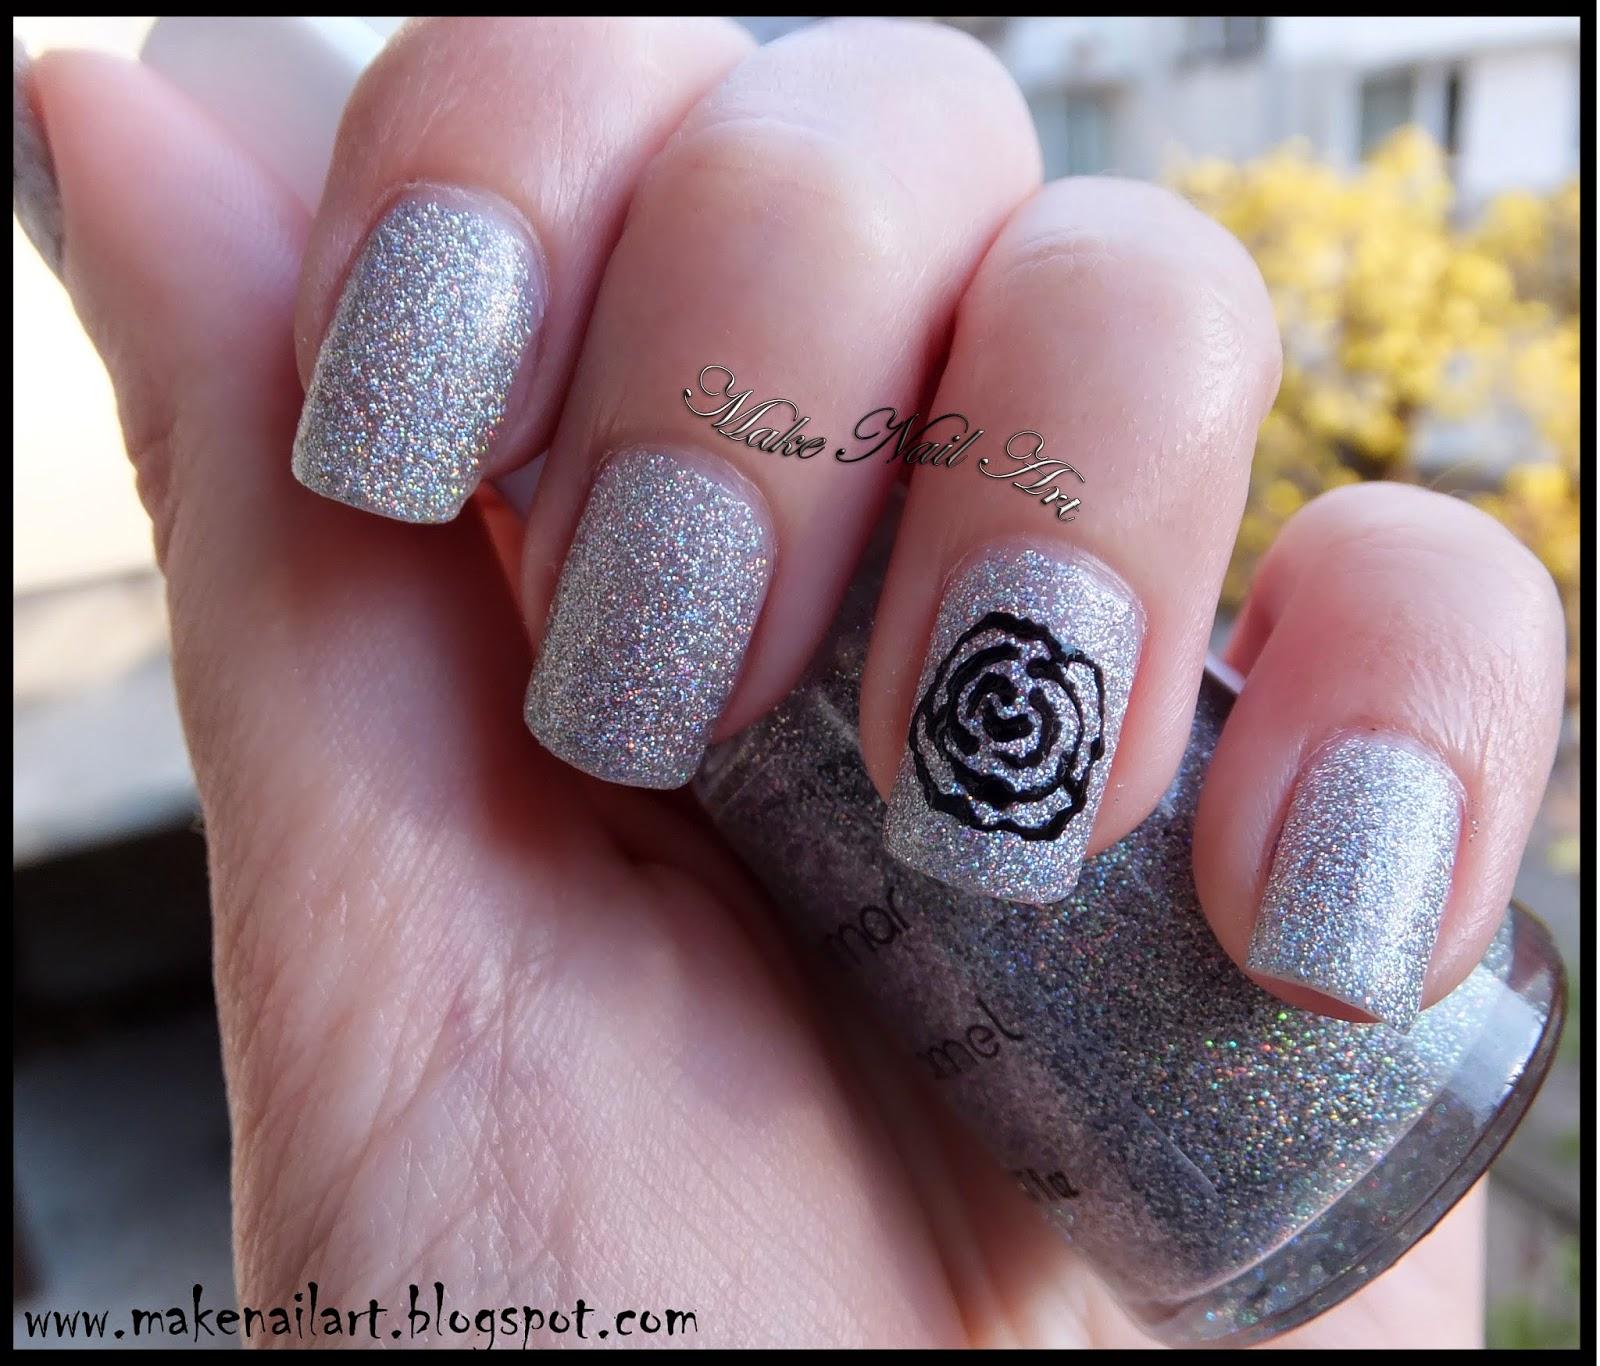 Make Nail Art: Easy Black Rose Nail Art Tutorial